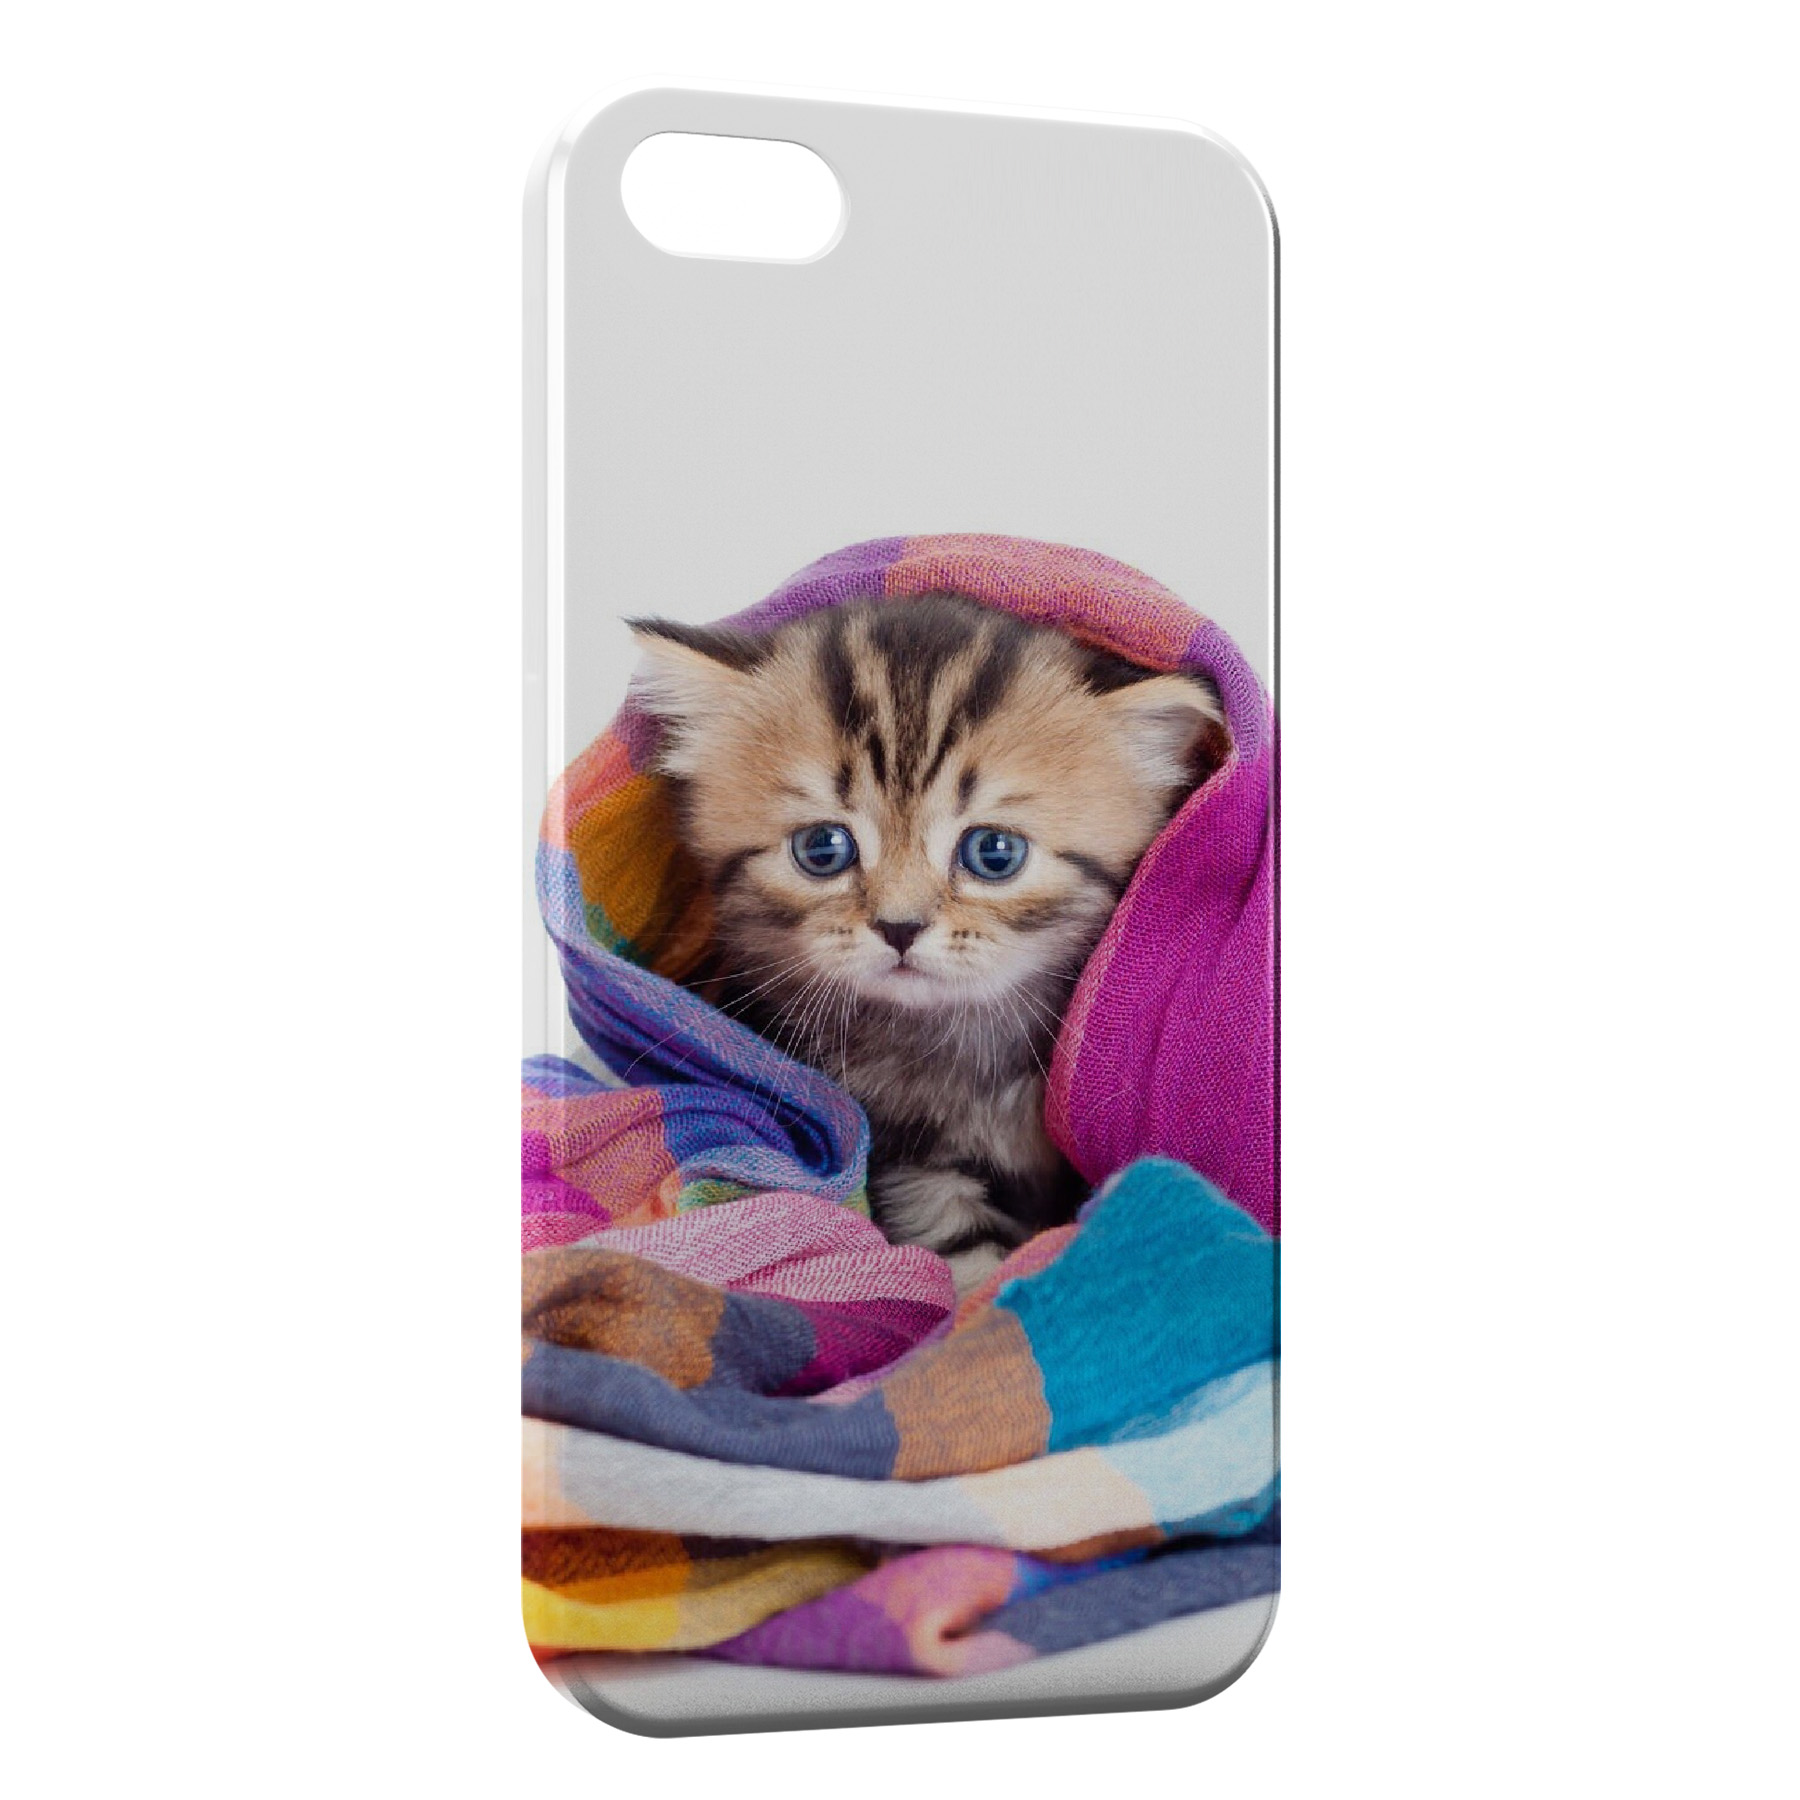 Coque iPhone 4 4S Chat Mignon Serviette